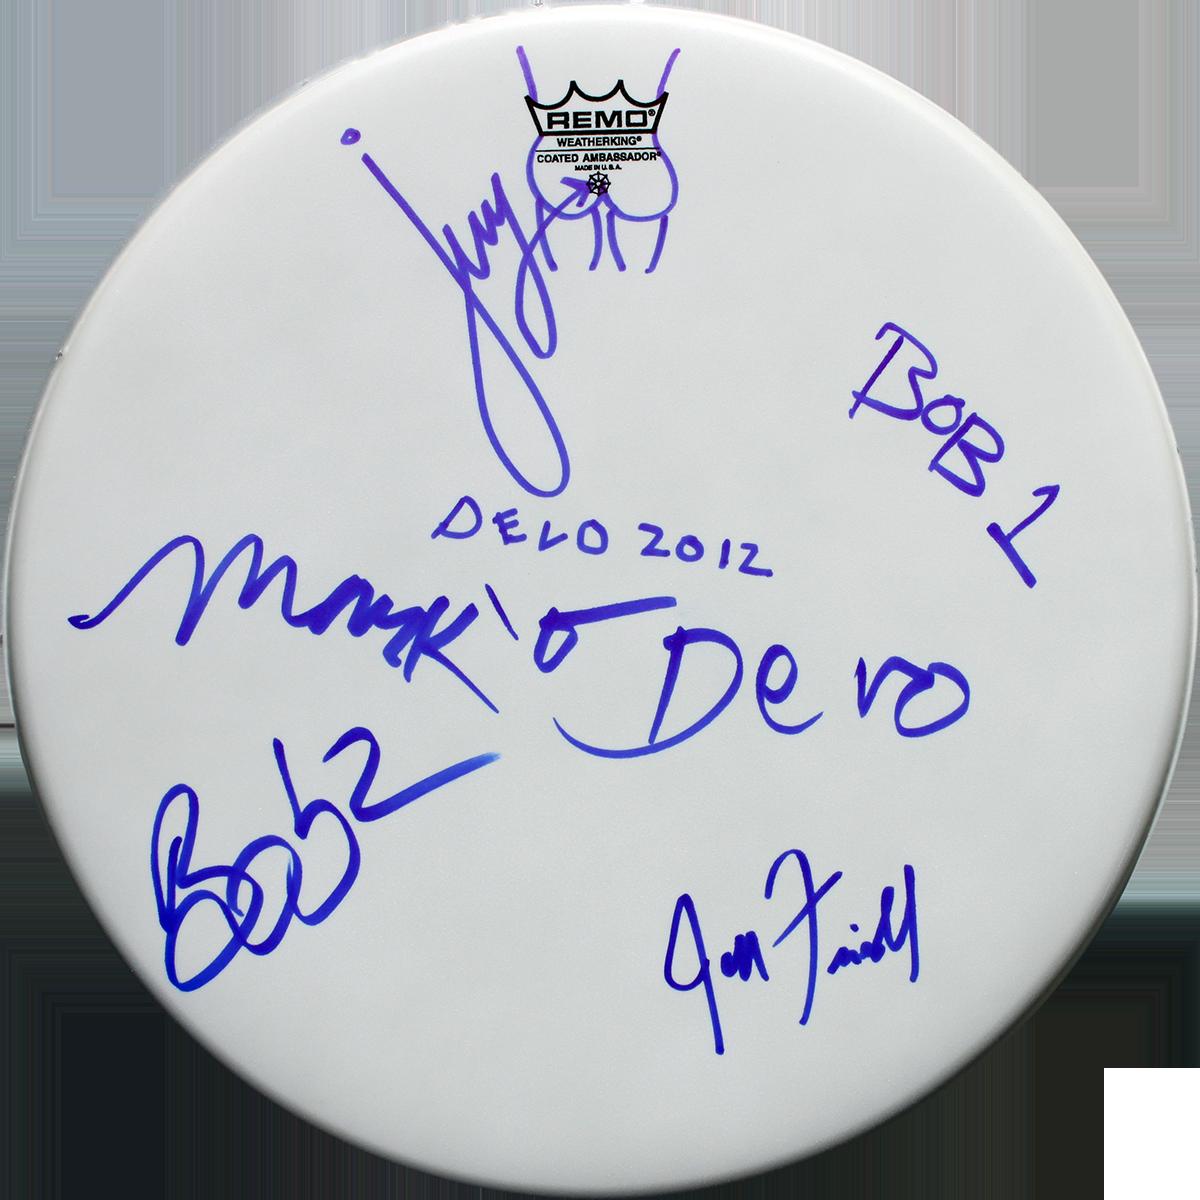 Devo - Drumhead